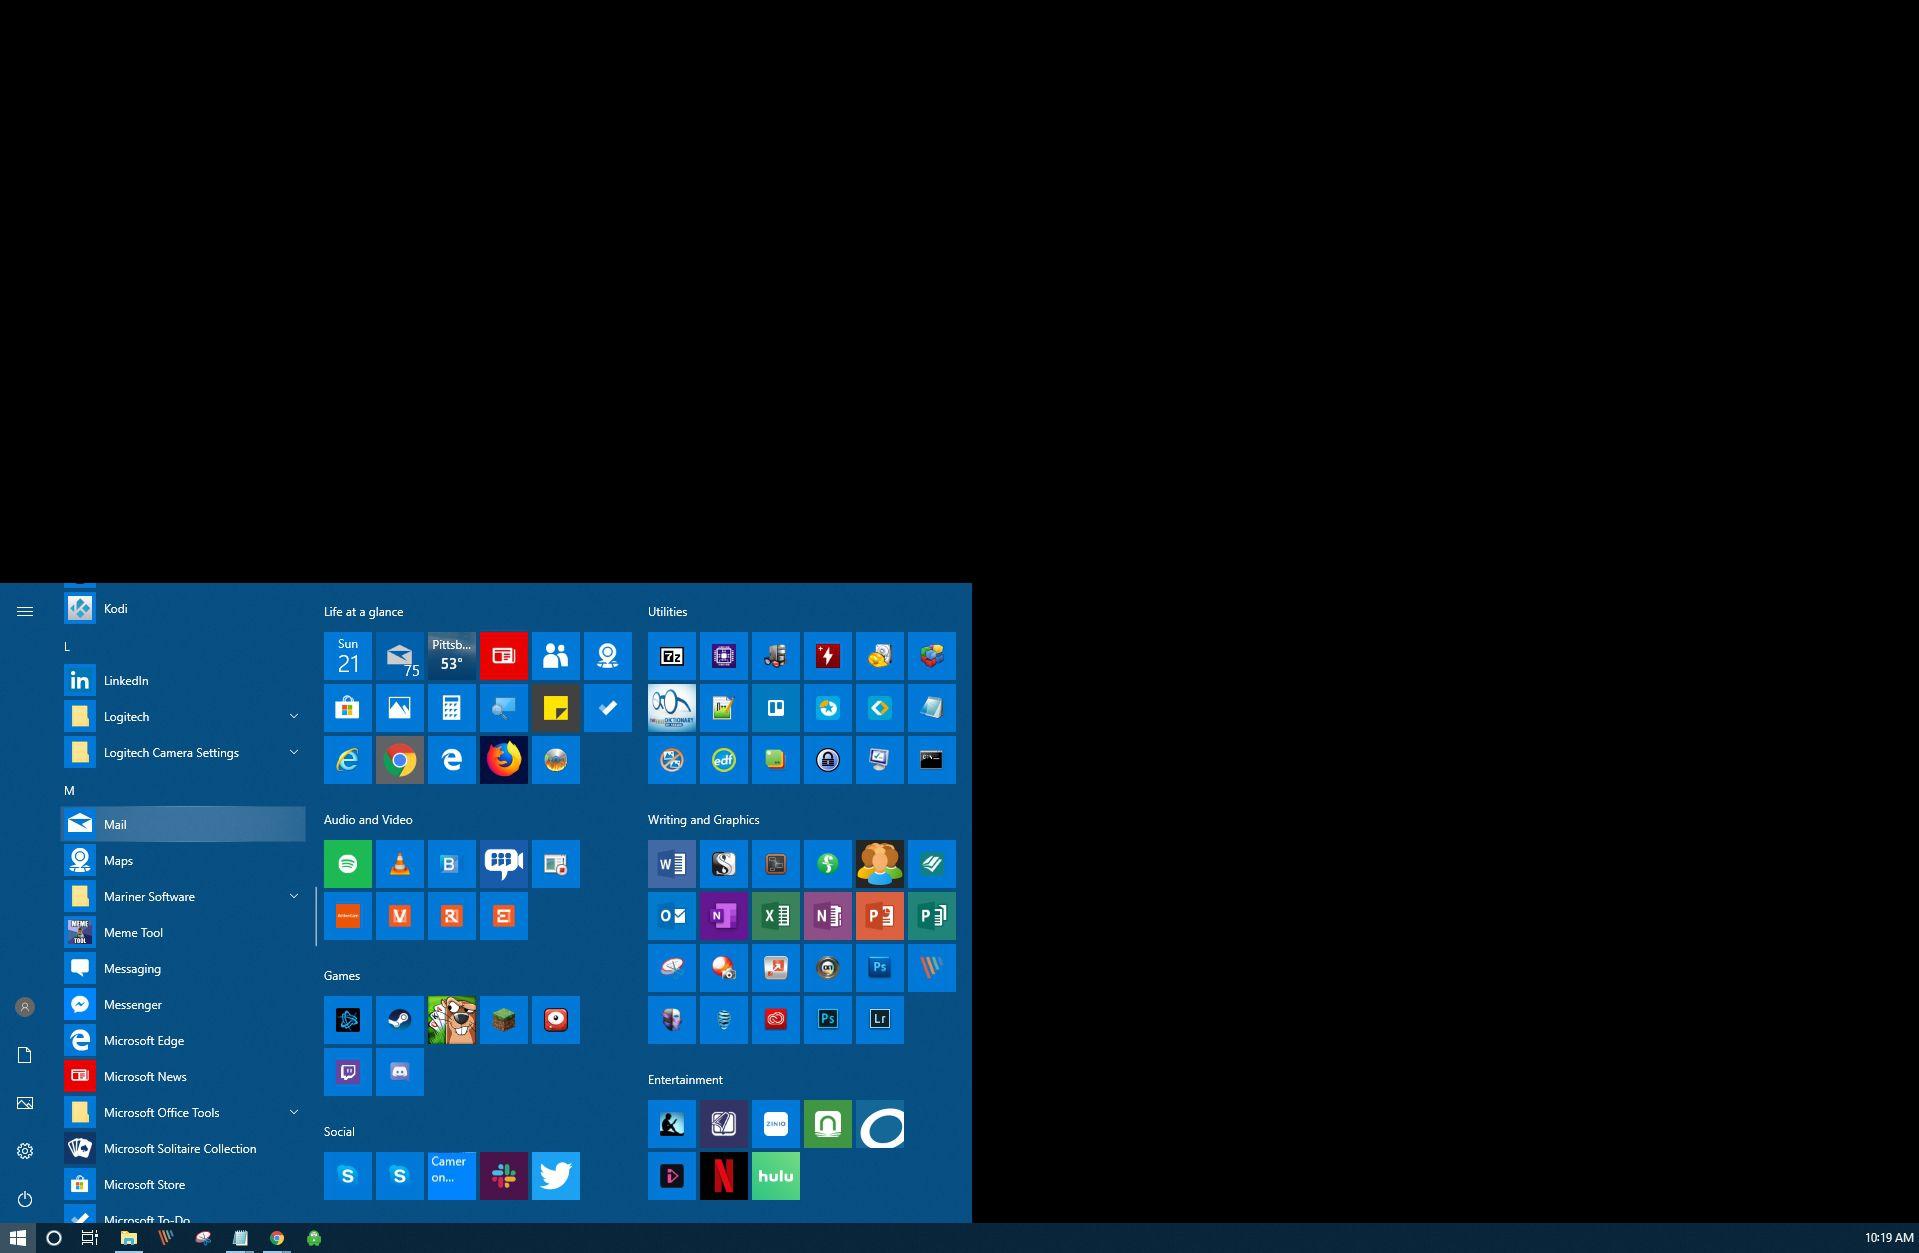 Selecting Windows 10 mail app.